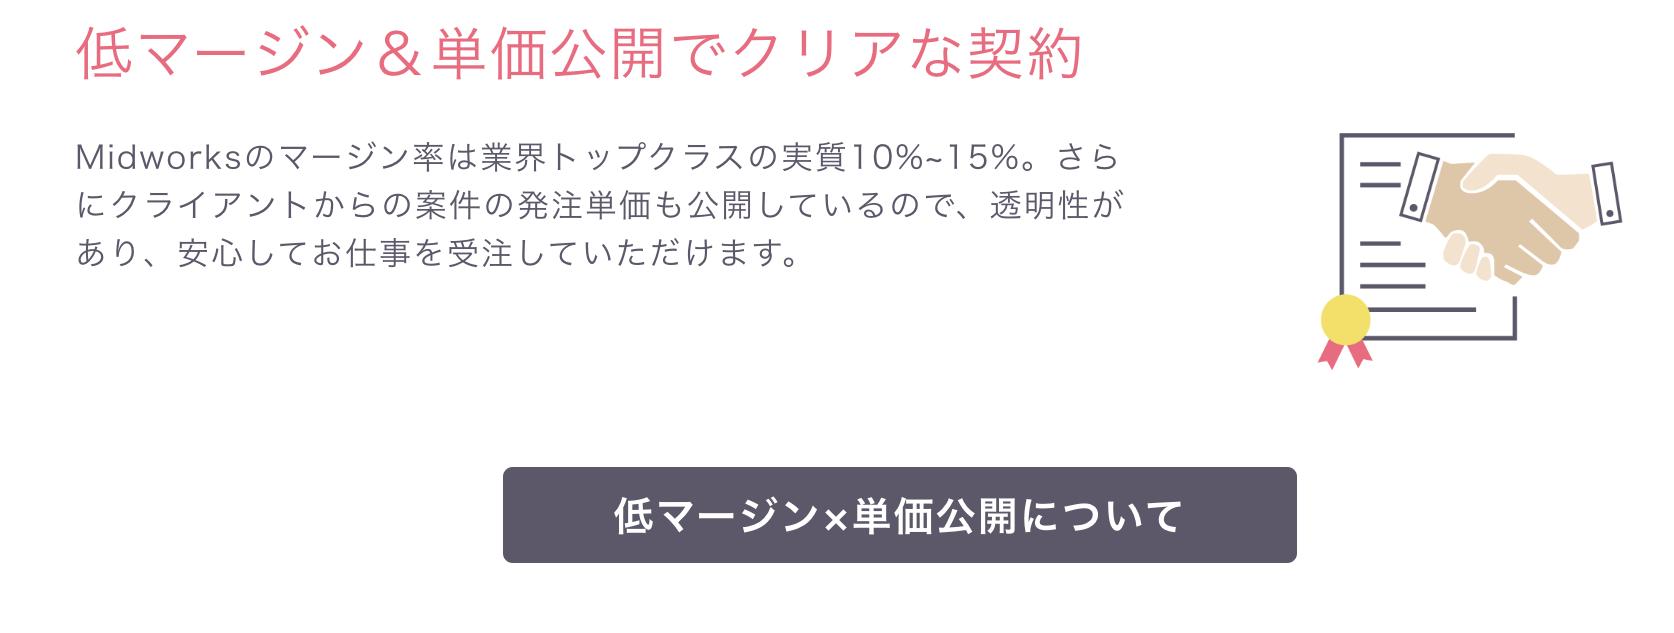 Midworksのマージンは業界トップクラスの低さ。実質10%から15%です。